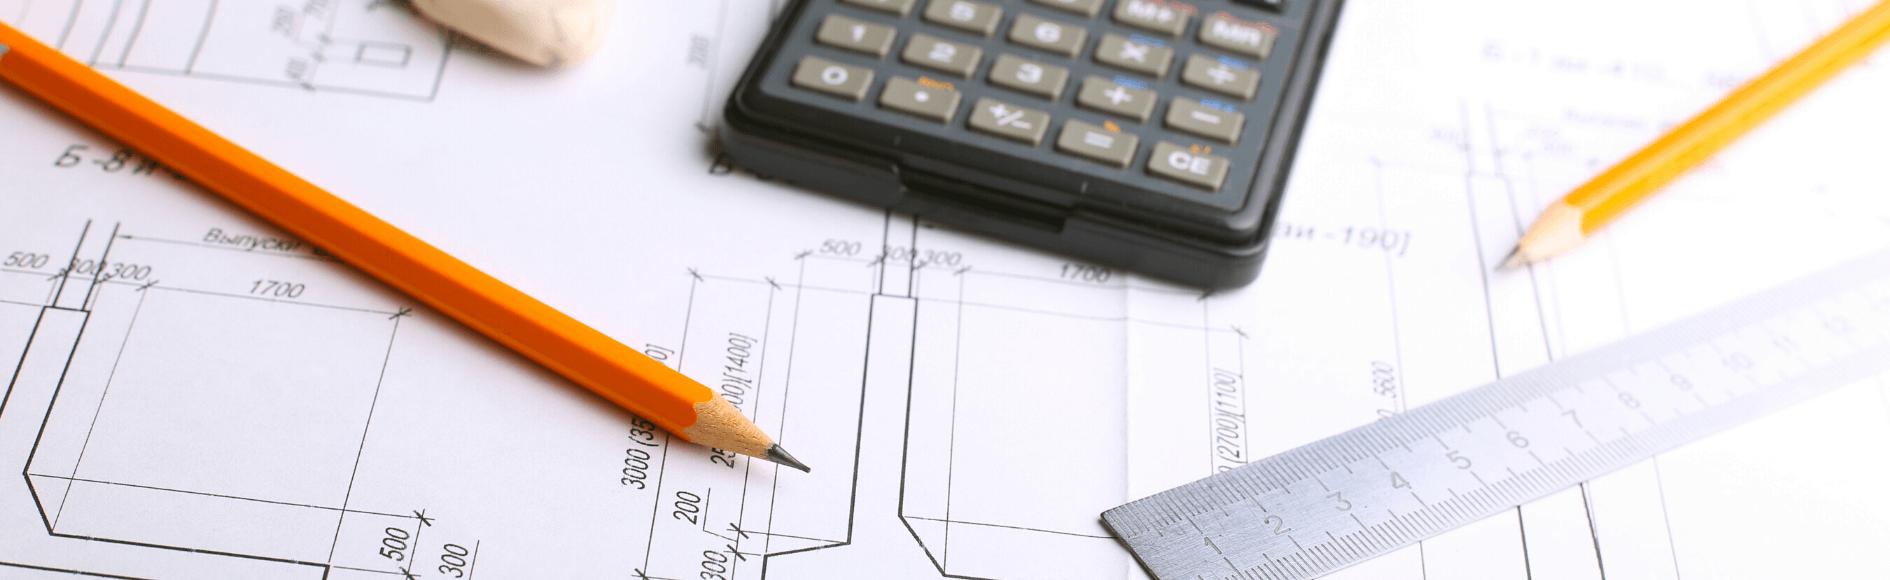 Helping You Build A Financial Future